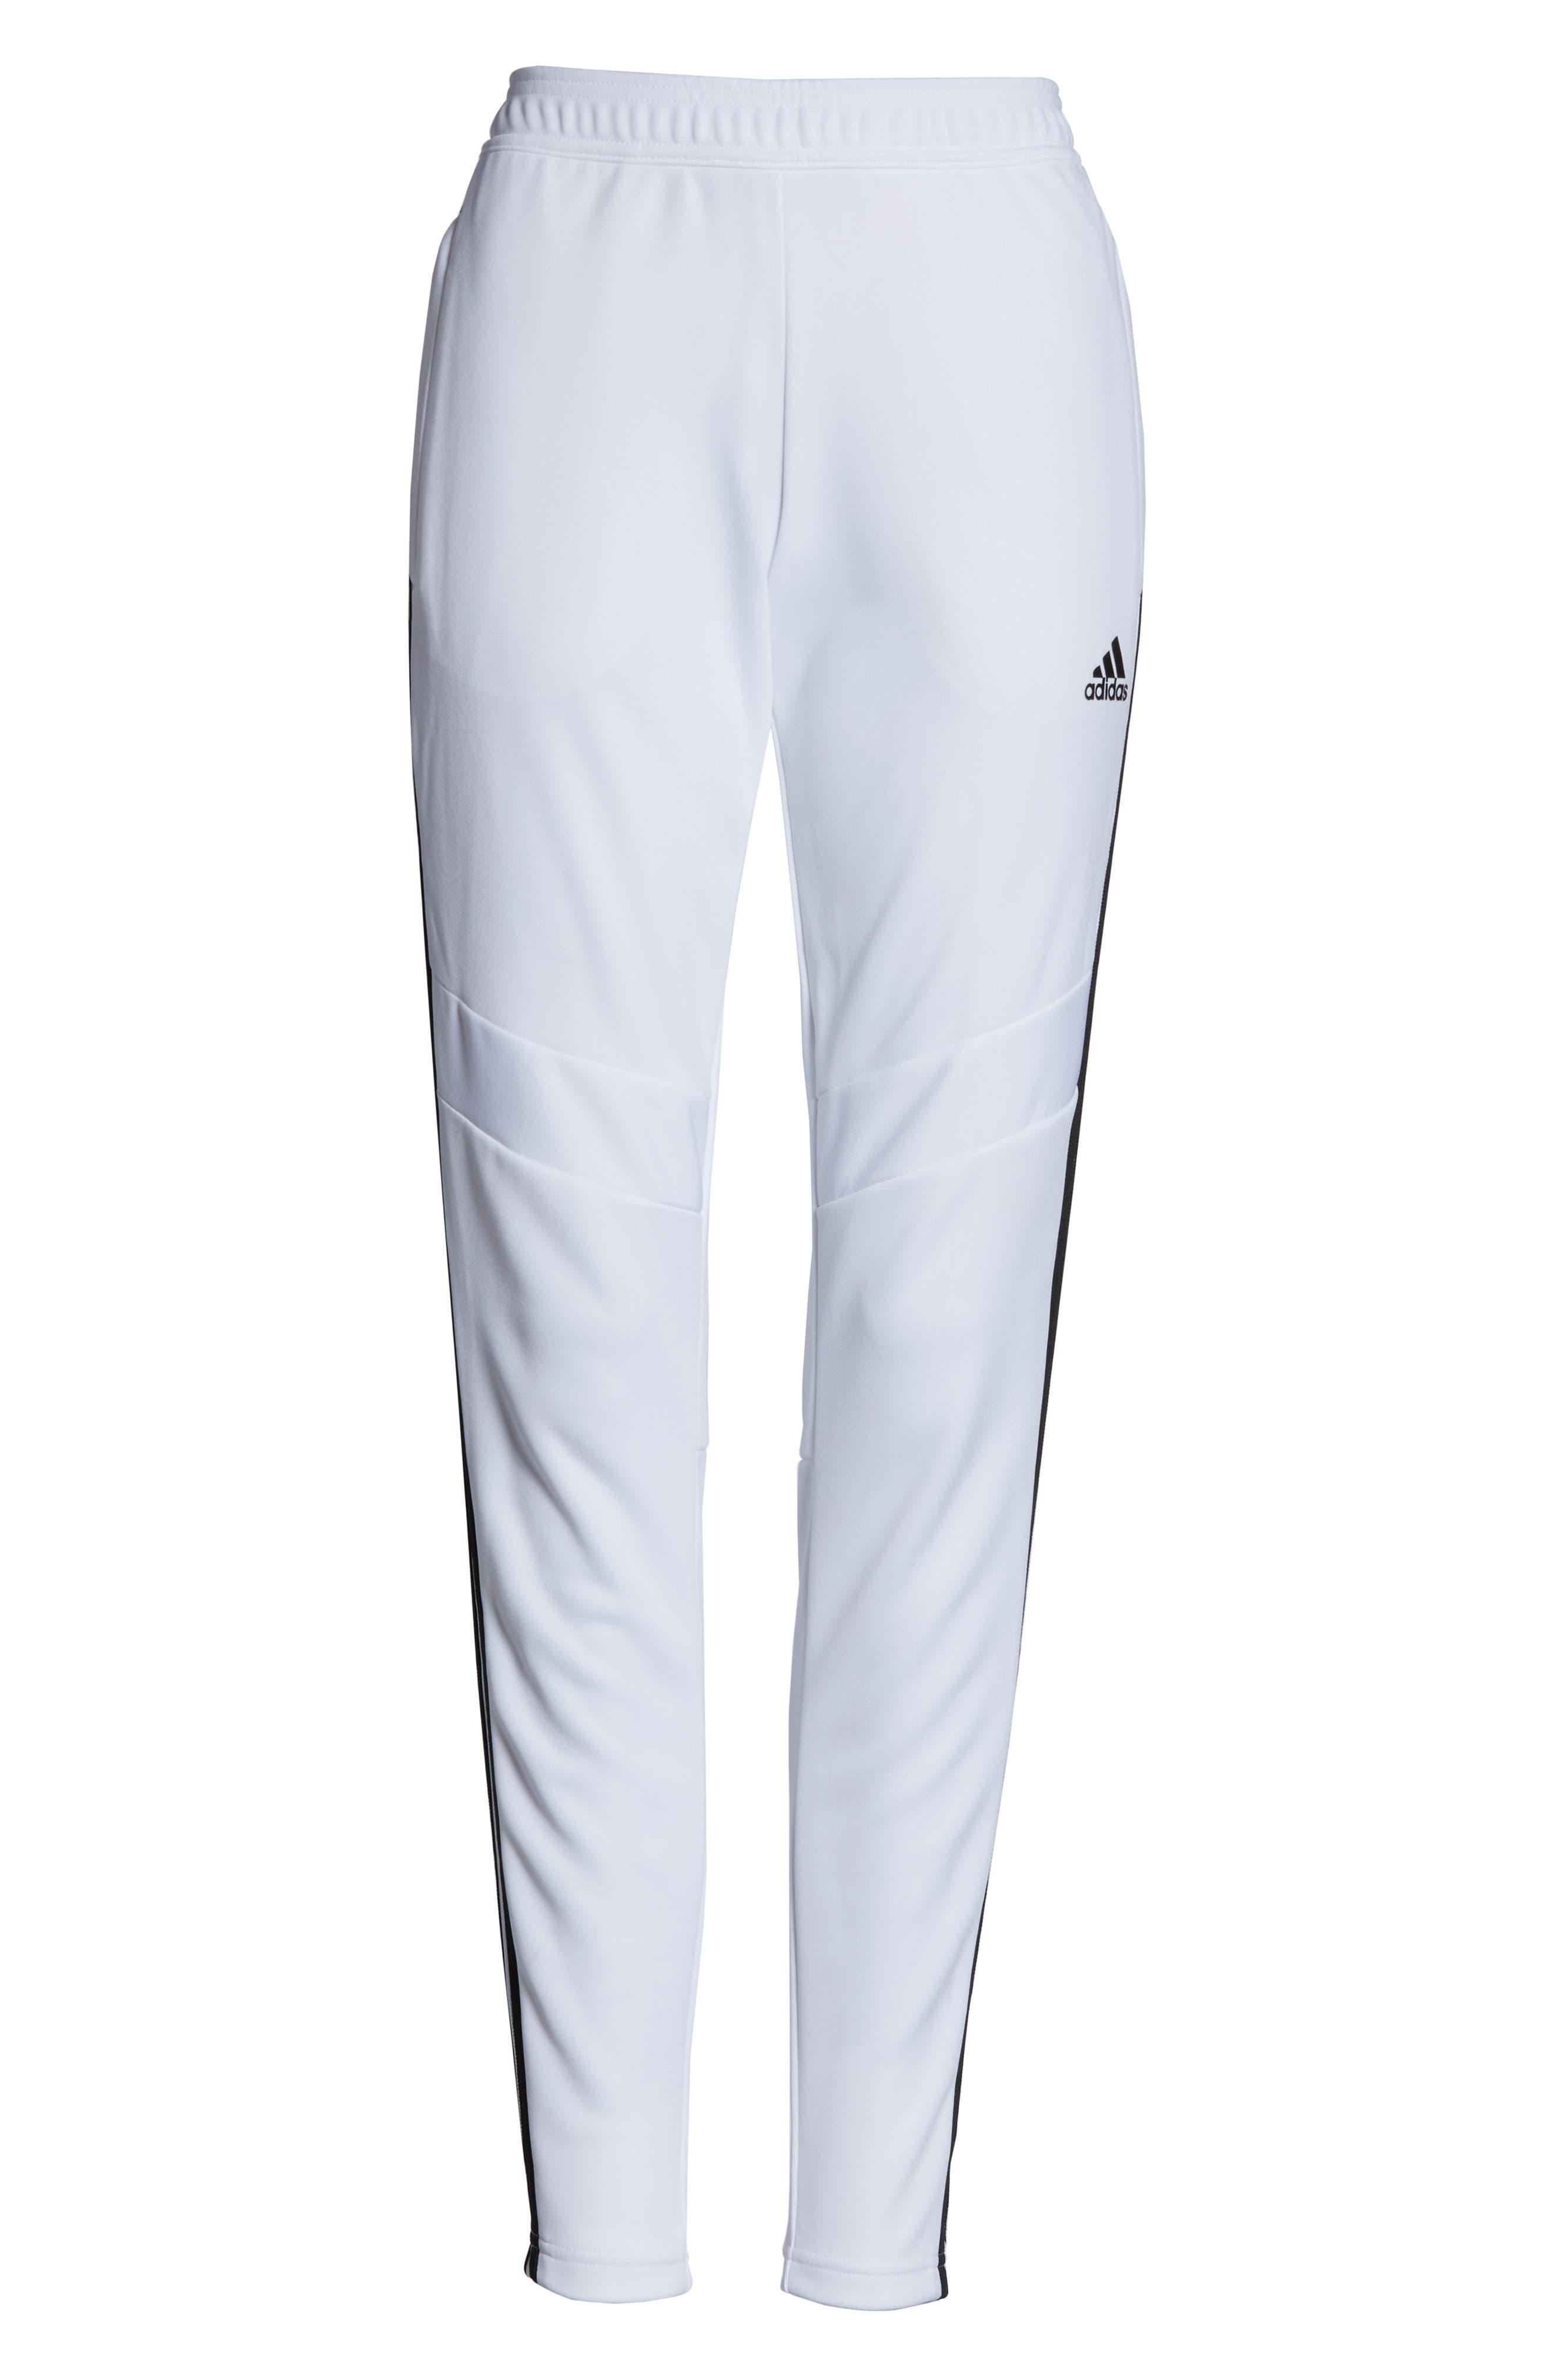 ADIDAS, Tiro 19 Training Pants, Alternate thumbnail 7, color, WHITE/ BLACK